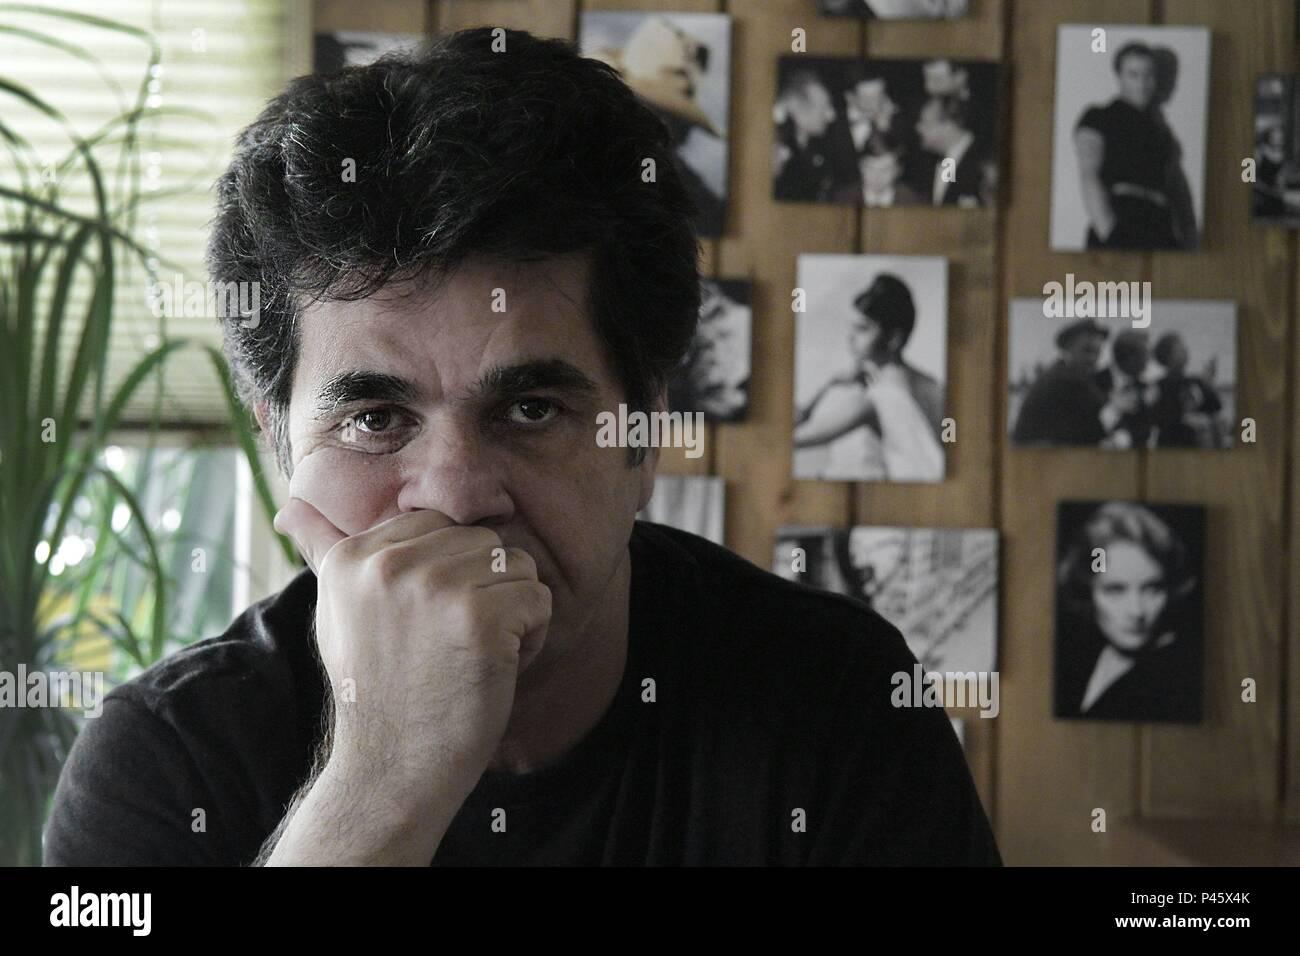 Original Film Title: IN FILM NIST.  English Title: IN FILM NIST.  Film Director: JAFAR PANAHI; MOJTABA MIRTAHMASB.  Year: 2011.  Stars: JAFAR PANAHI. Credit: JAFAR PANAHI FILM PRODUCTIONS / Album - Stock Image